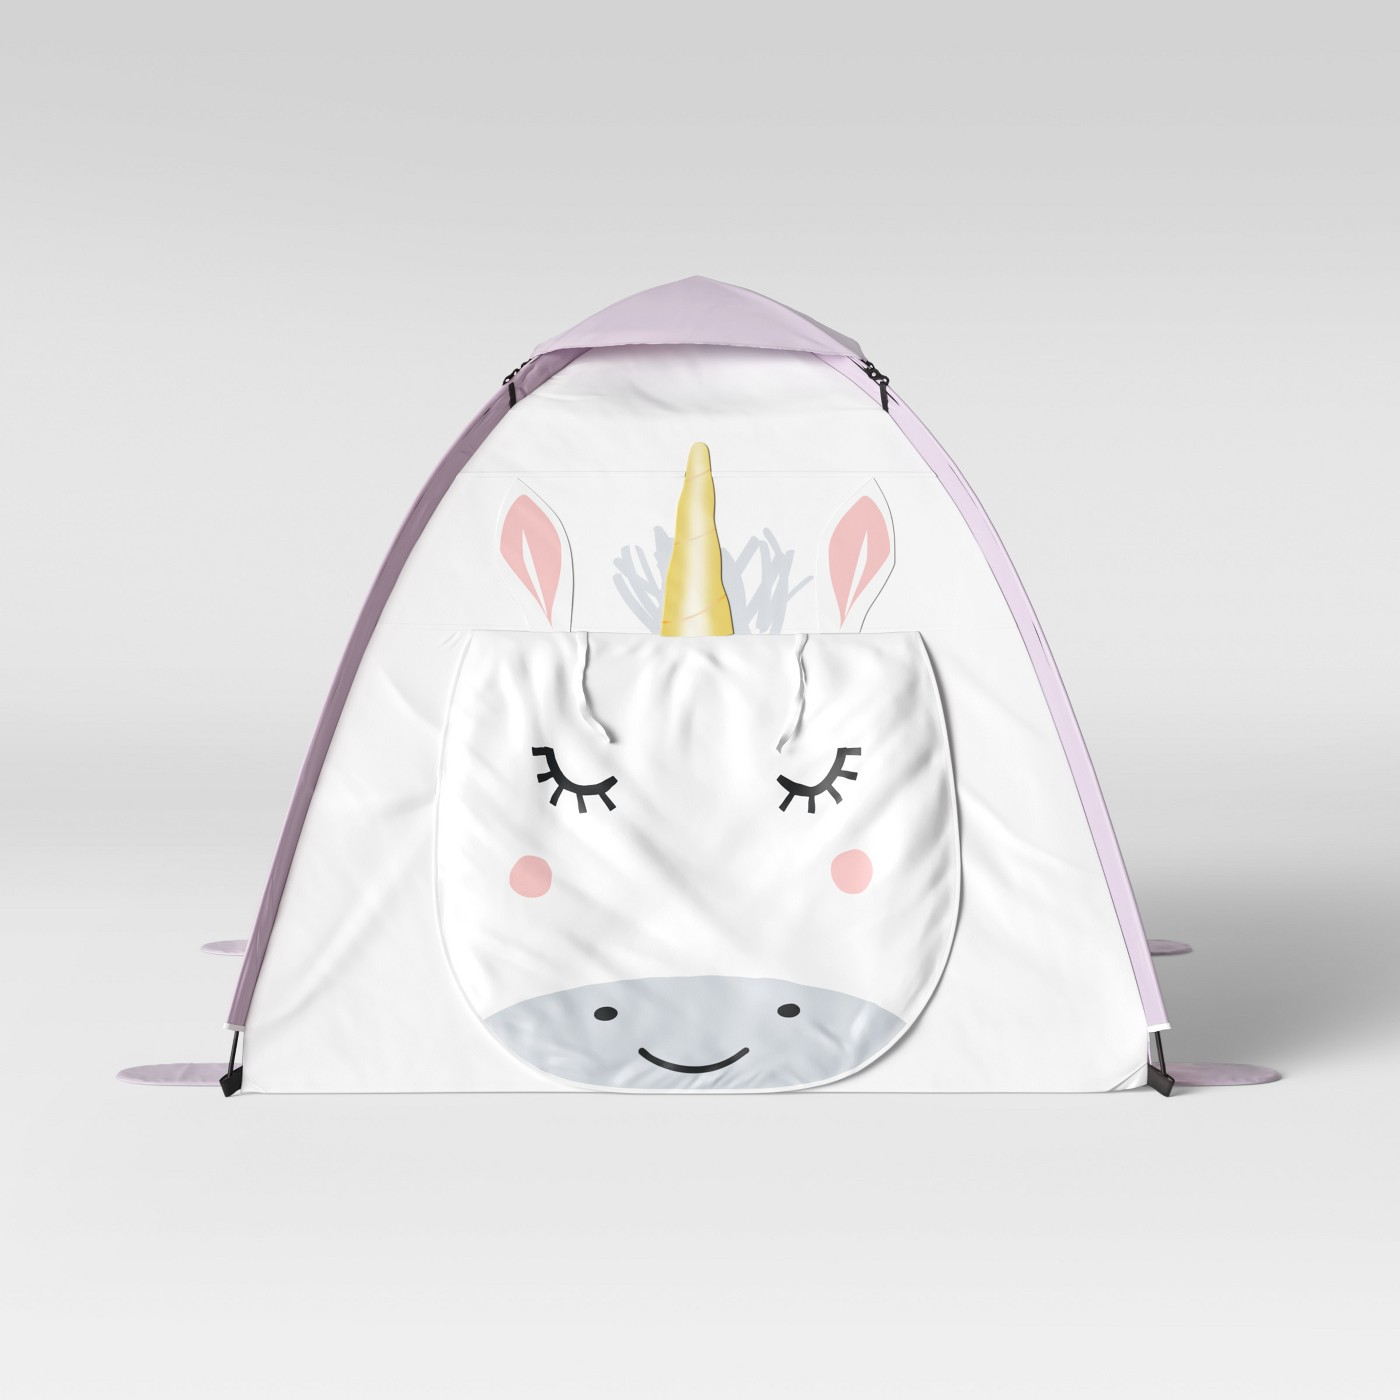 glamping unicorn tent